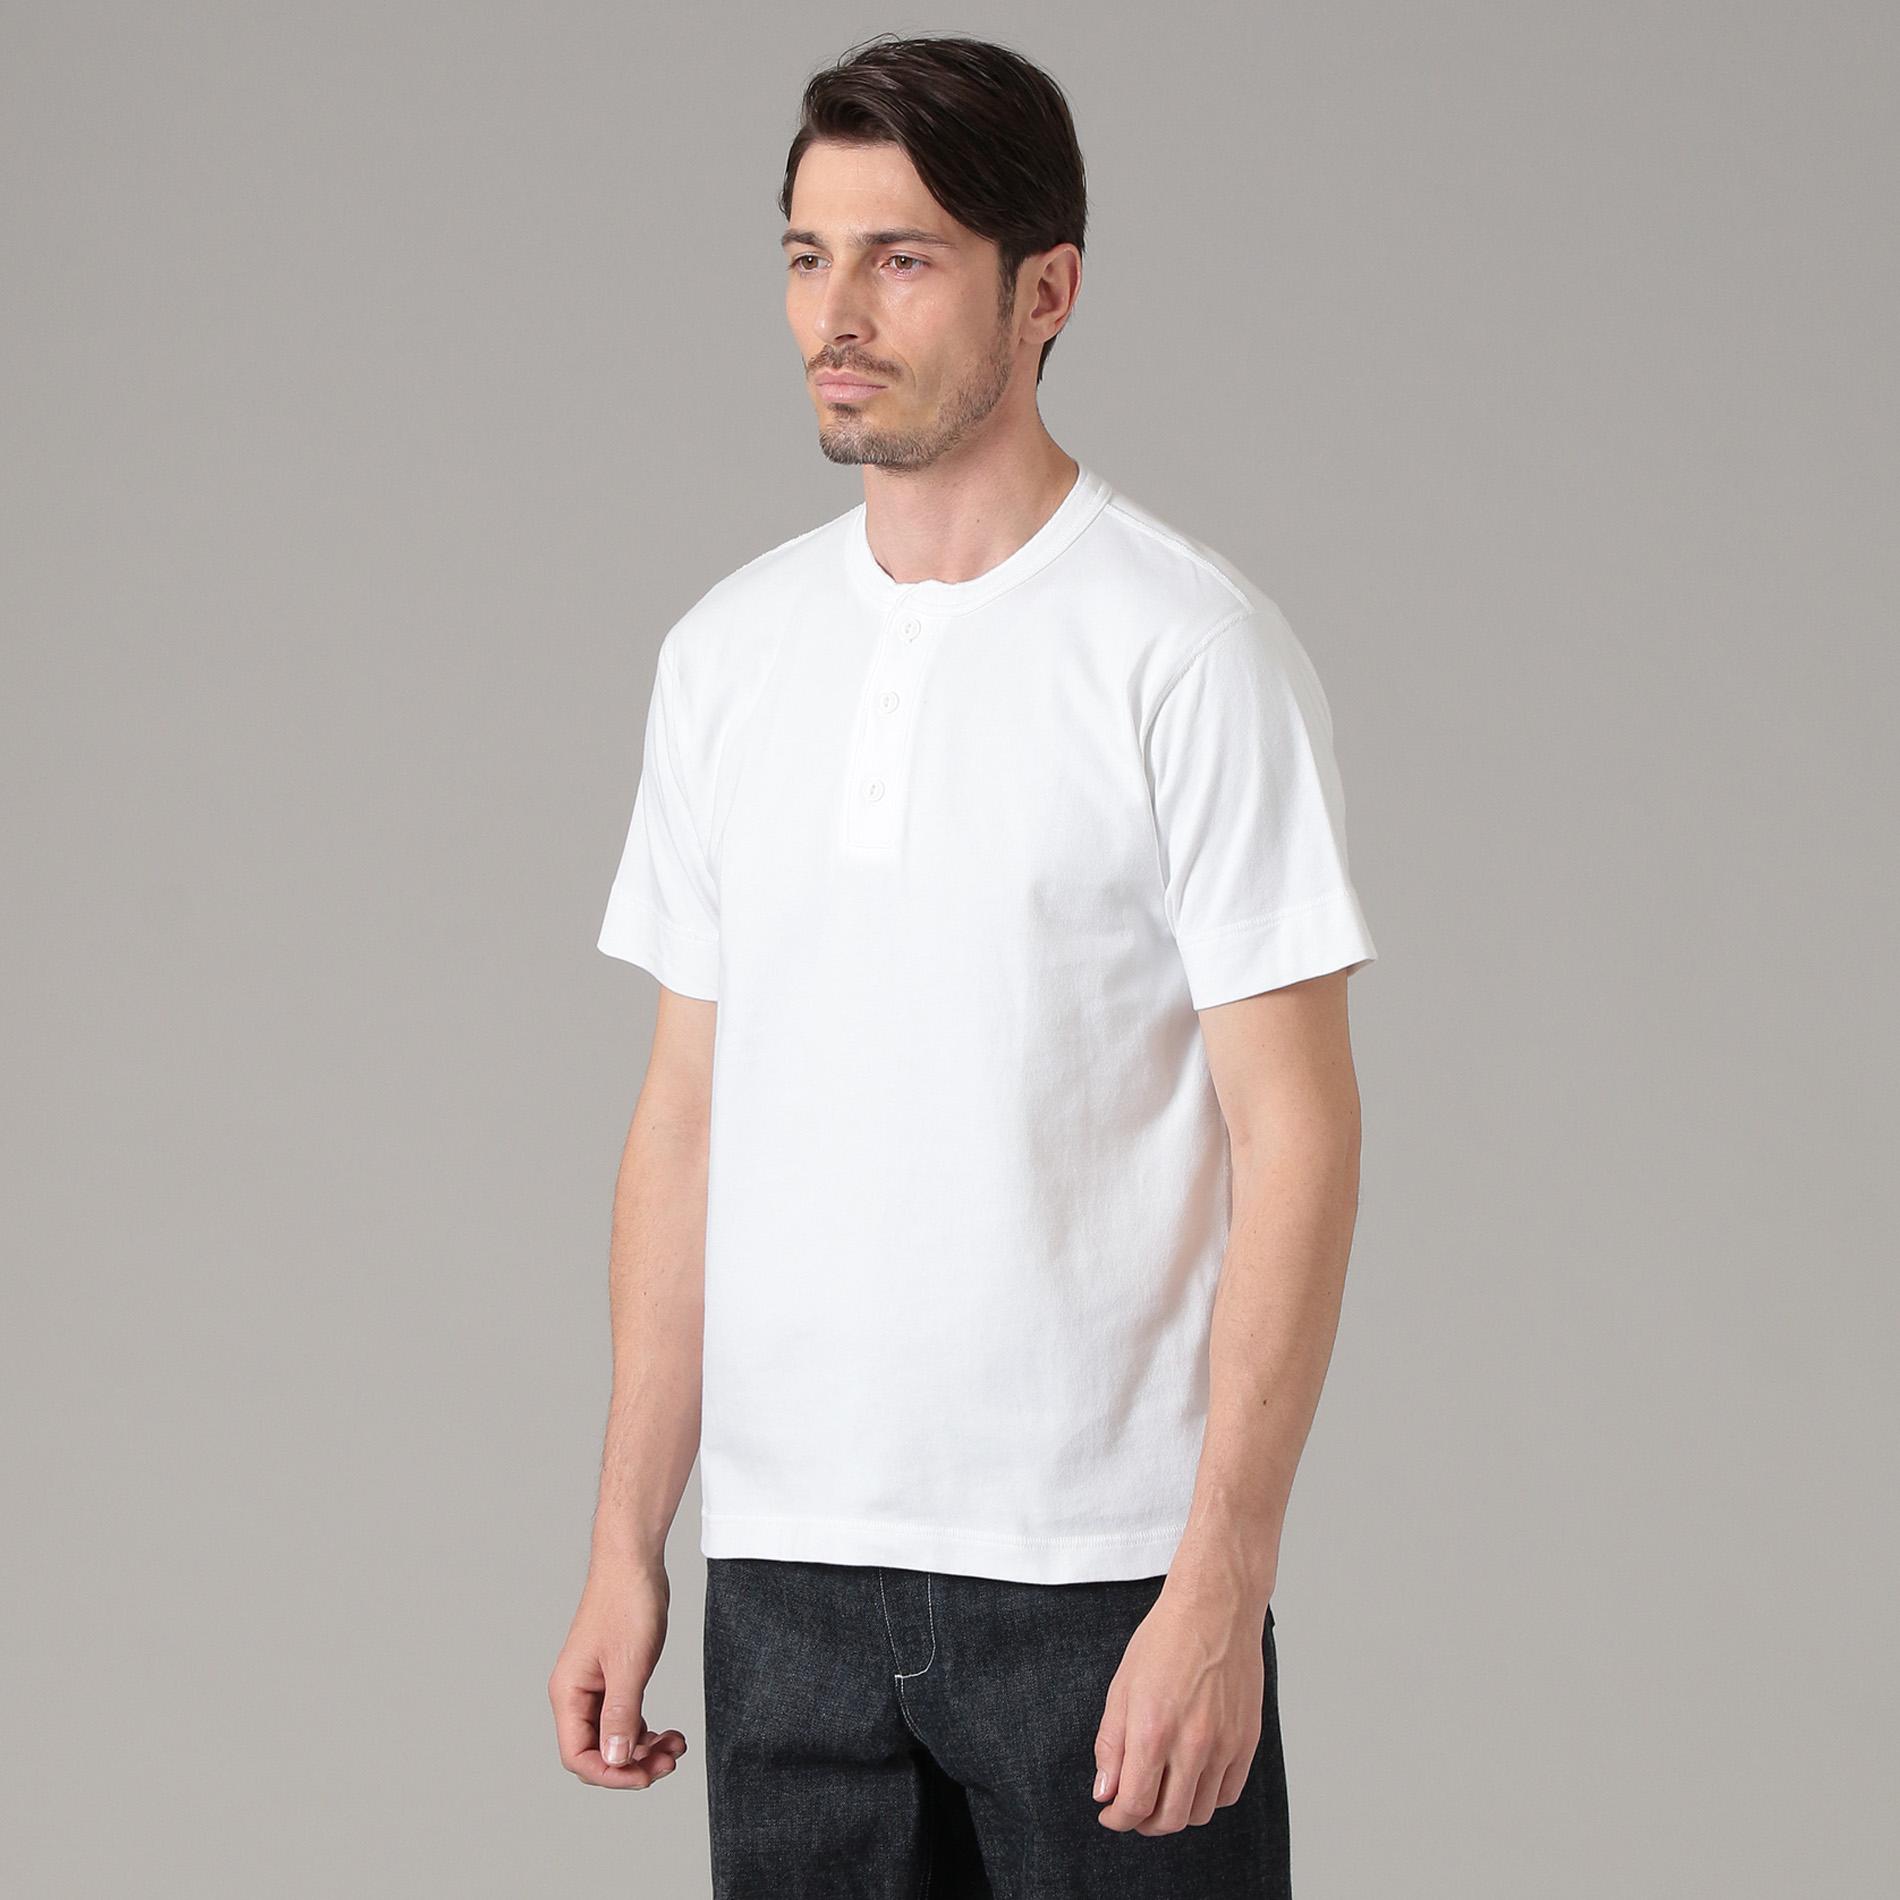 【Healthknit】コラボヘンリーネックTシャツ